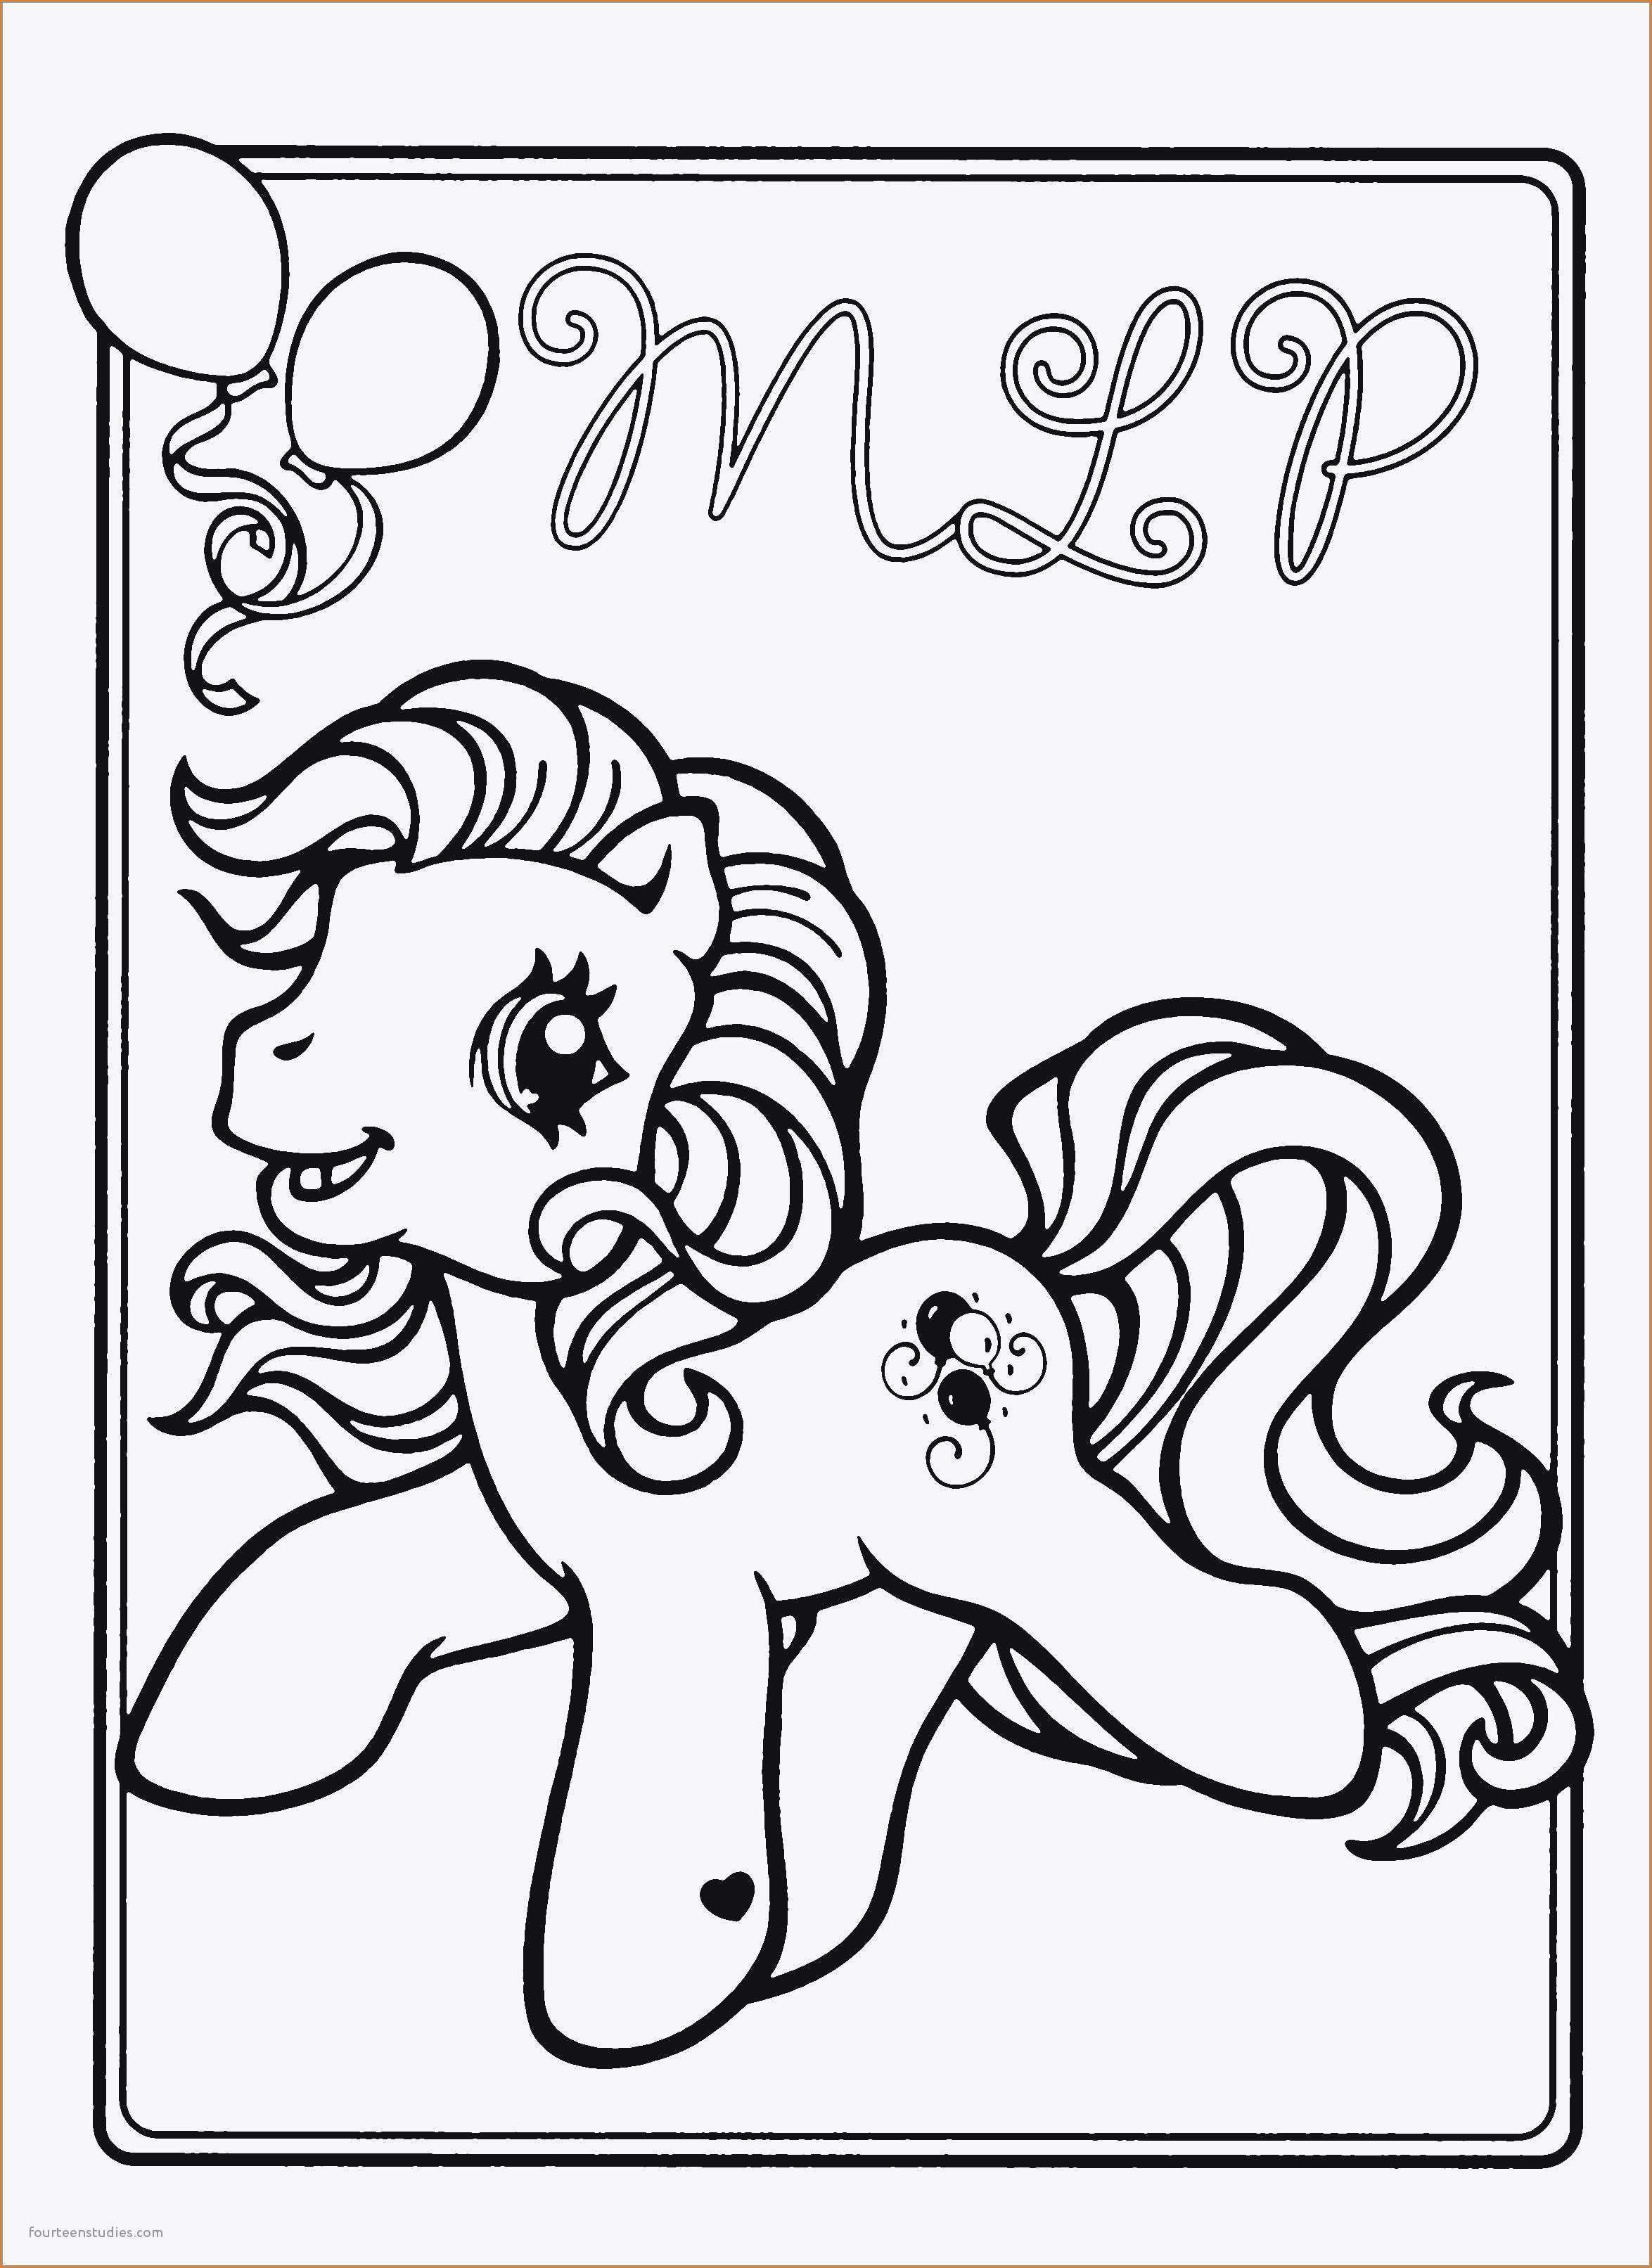 Rainbow Dash Ausmalbilder Neu 40 Ausmalbilder Equestria Girls Scoredatscore Elegant Equestria Girl Fotos